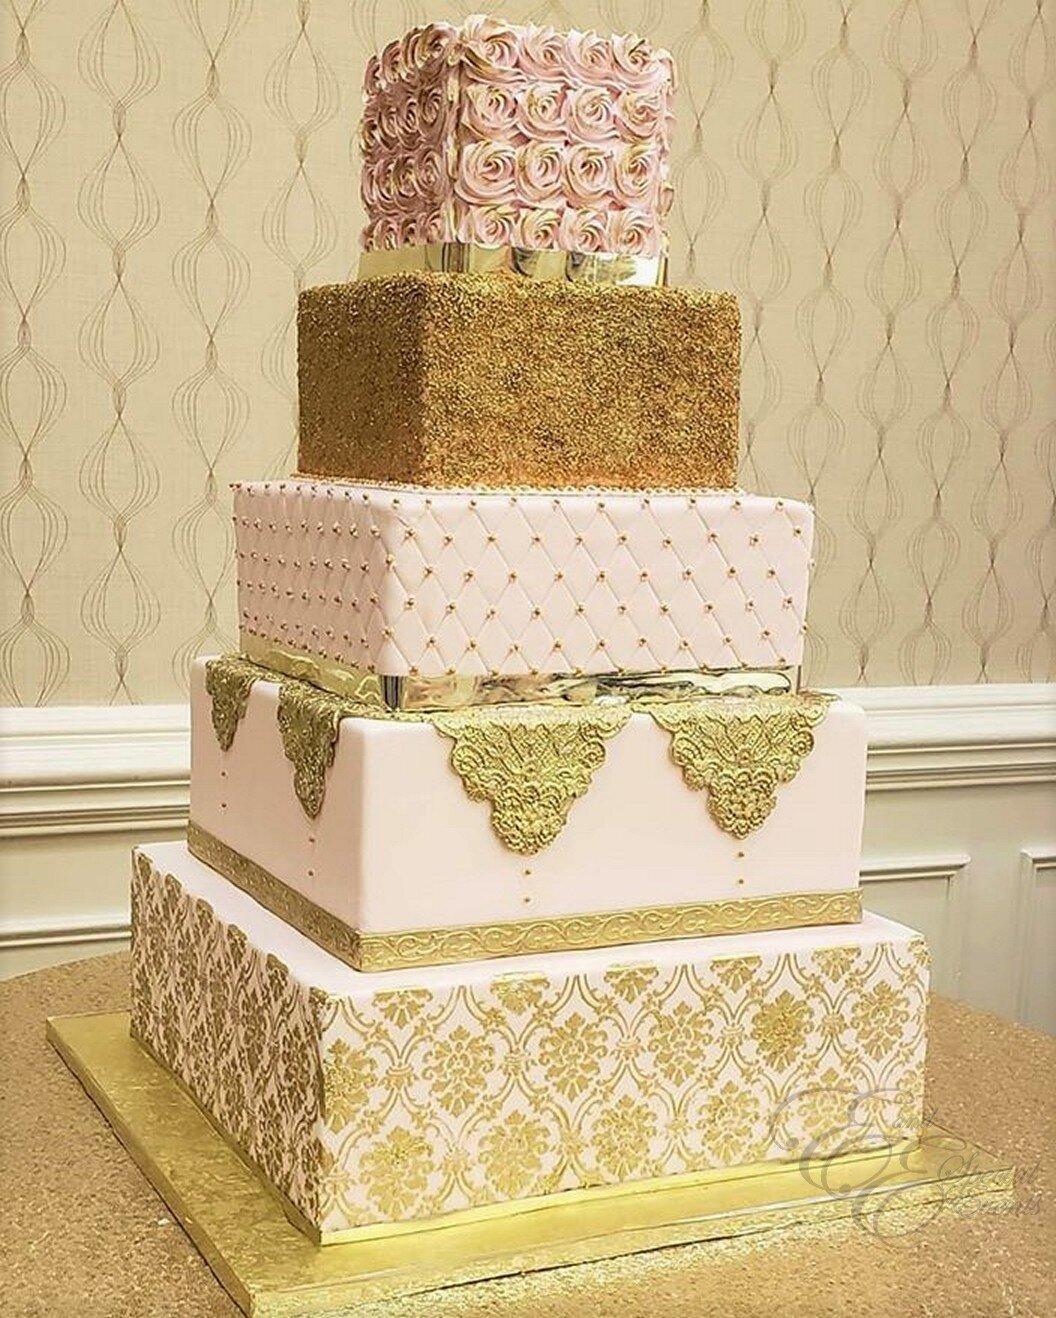 blush and gold square wedding cake.jpg